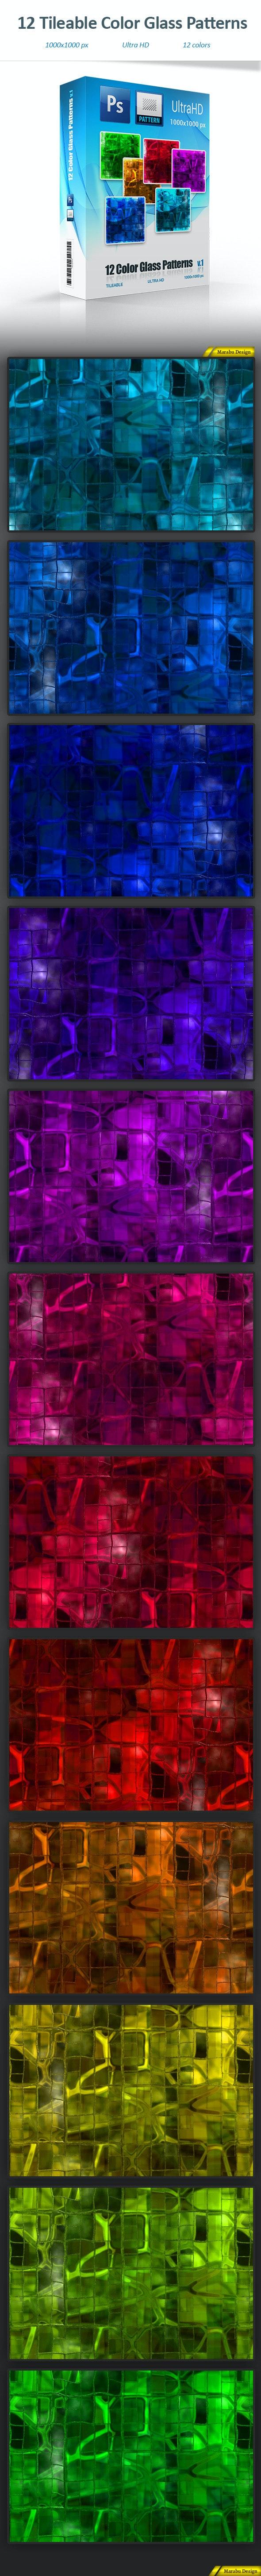 12 Color Glass Tileable Patterns (vol 1) - Textures / Fills / Patterns Photoshop